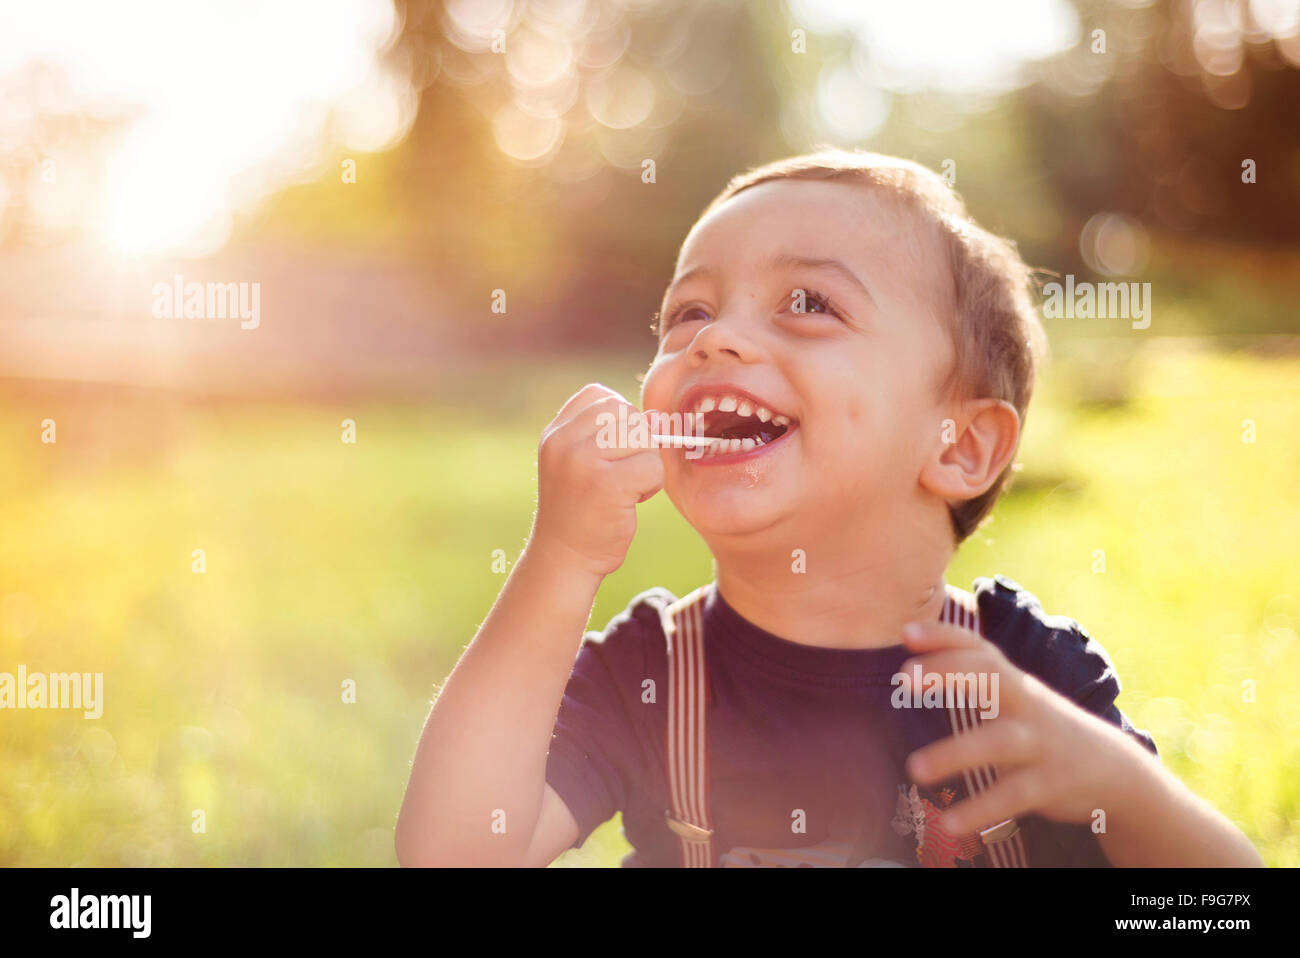 Cute little boy having fun outside in summer nature - Stock Image